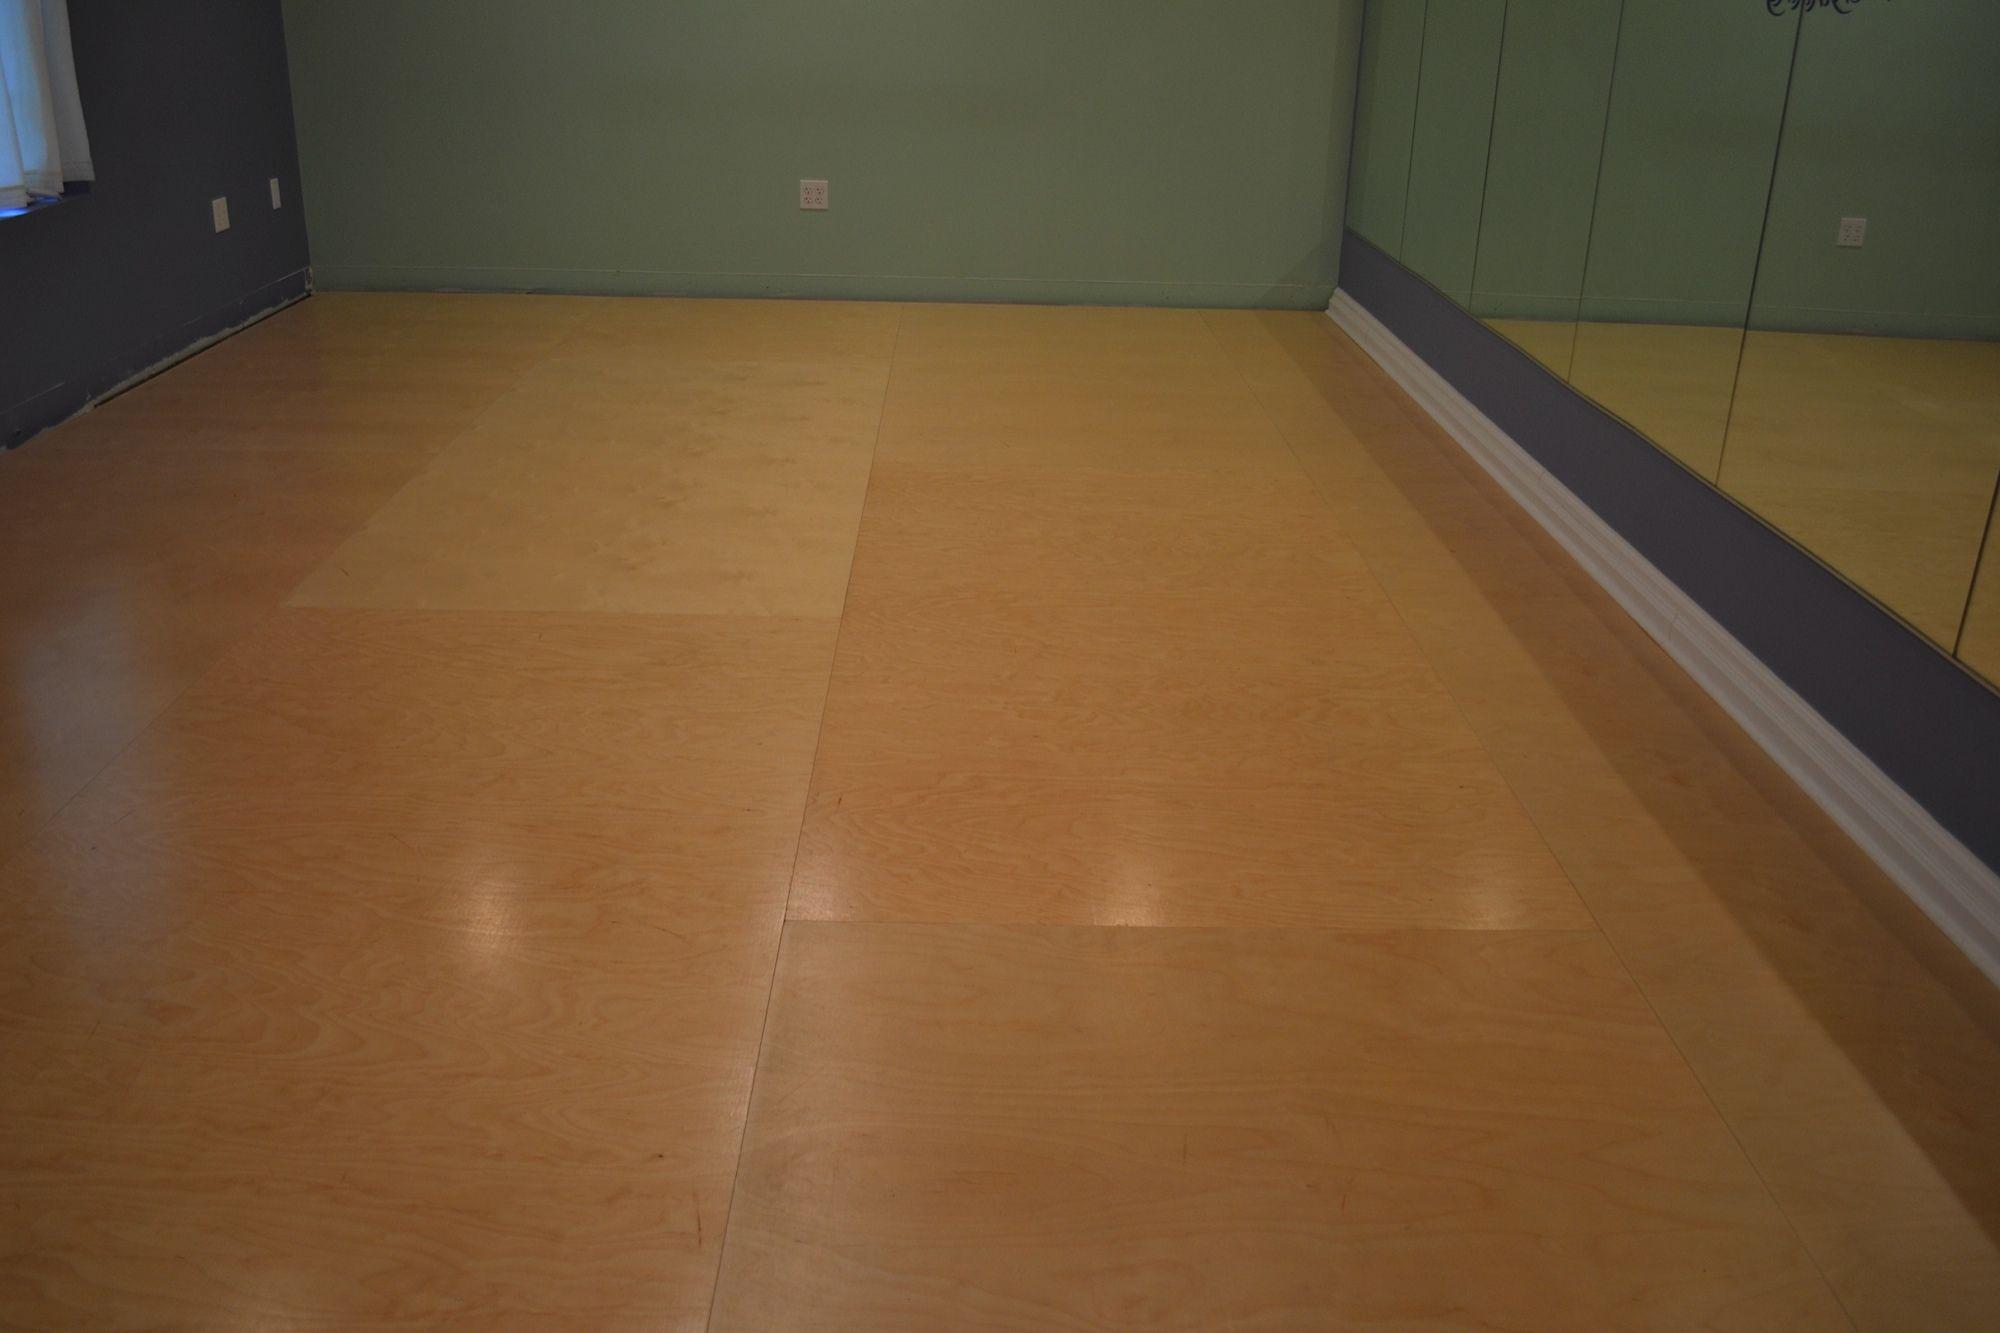 Dance Studio Flooring High Quality Performance Dance Floor